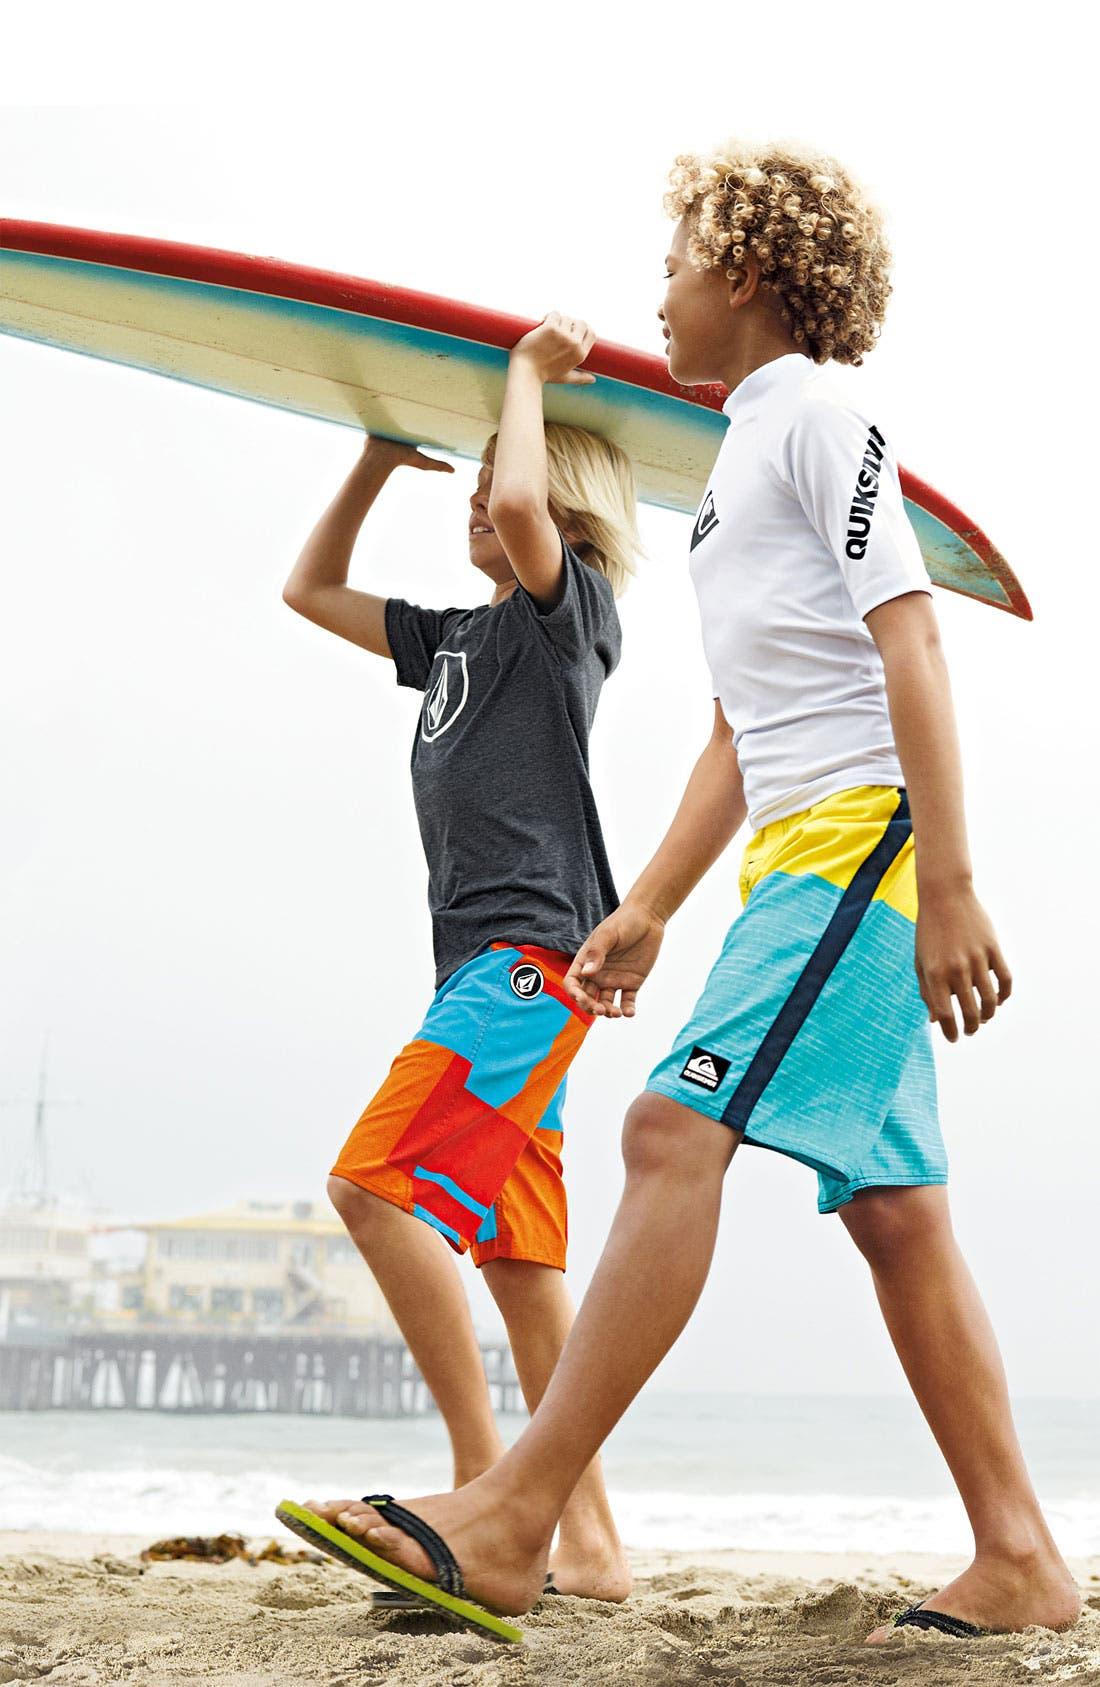 Main Image - Volcom T-Shirt, Board Shorts & Sandal (Big Boys)